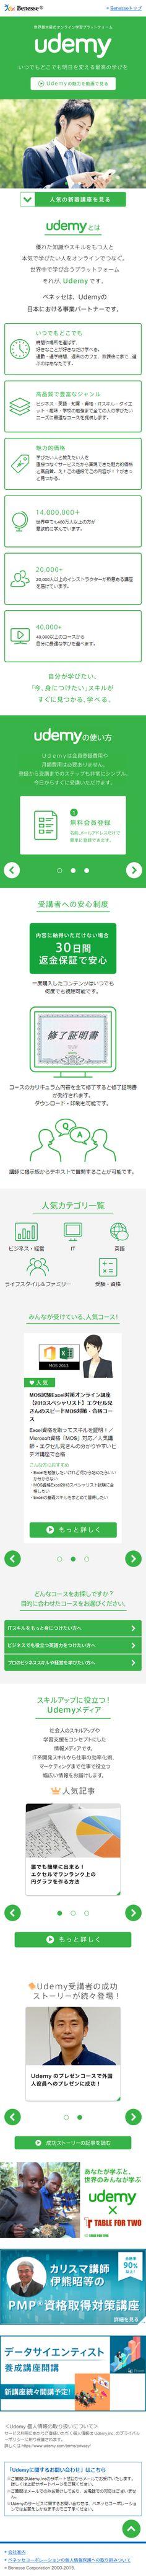 udemy|WEBデザイナーさん必見!スマホランディングページのデザイン参考に(シンプル系)